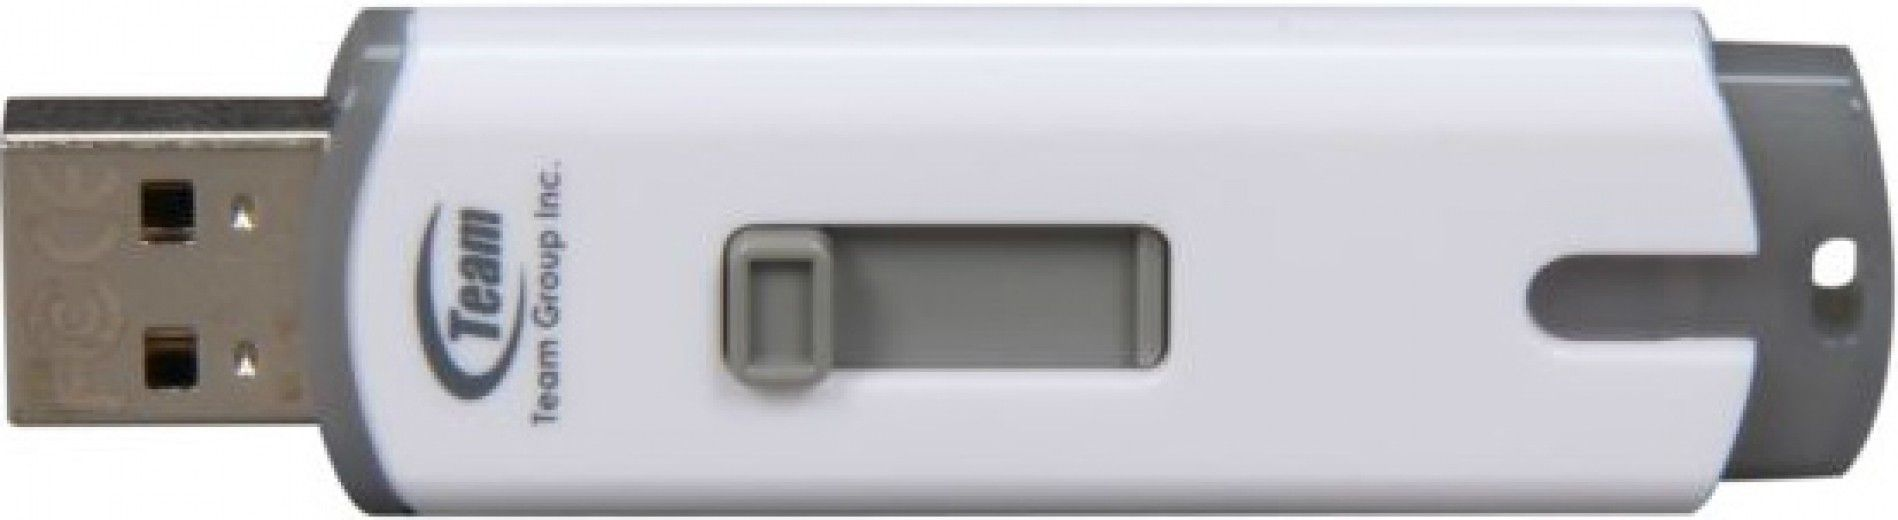 USB флеш накопитель Team C112 8GB Grey